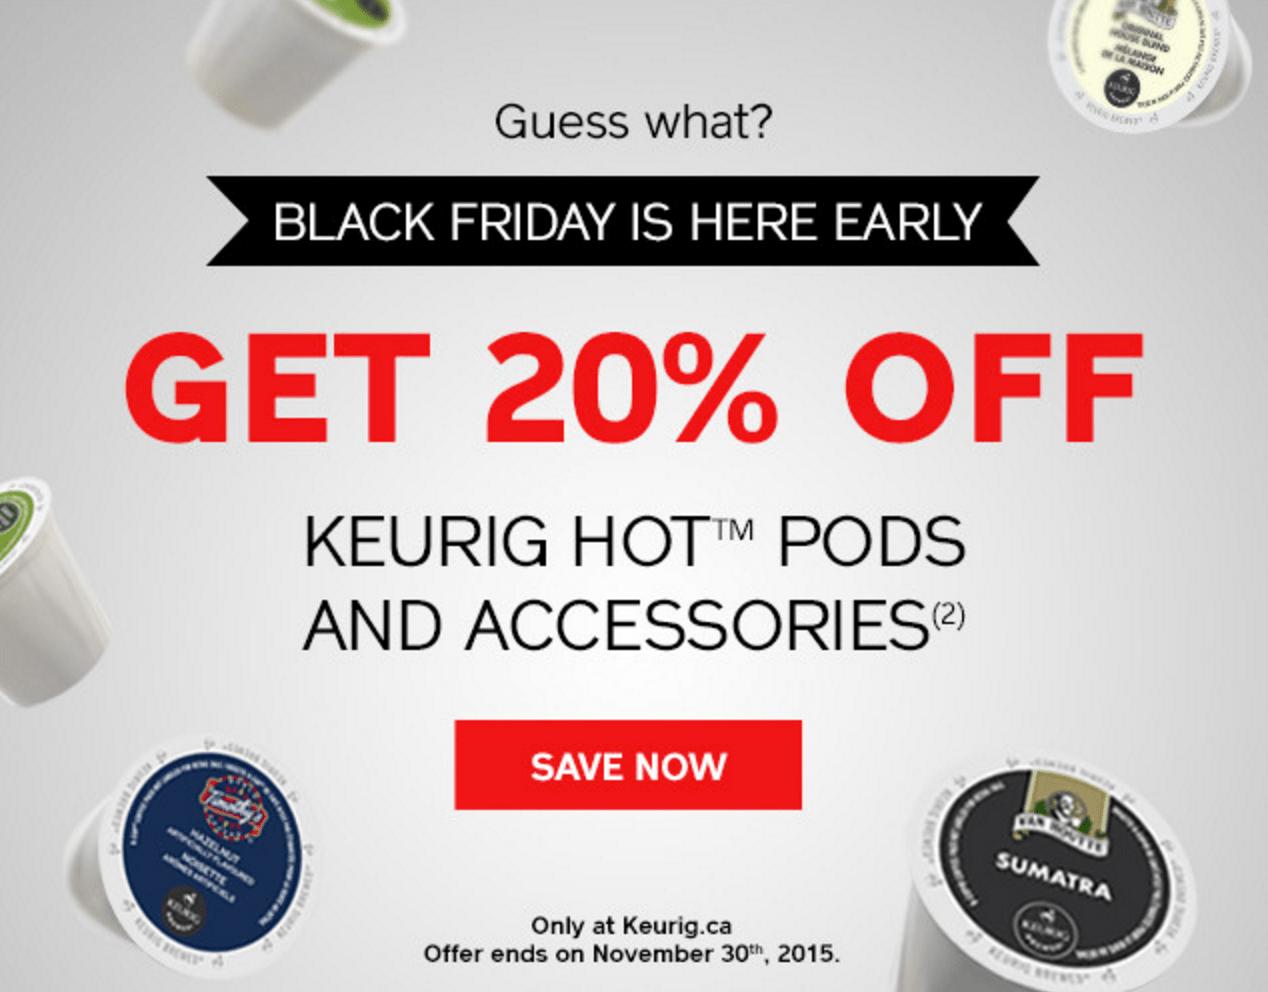 Keurig Coffee Maker Black Friday Deals 2015 : Keurig Canada Black Friday 2015 Sale: Save 20% Off Keurig Hot Pods & Accessories + Up To USD 60 Off ...